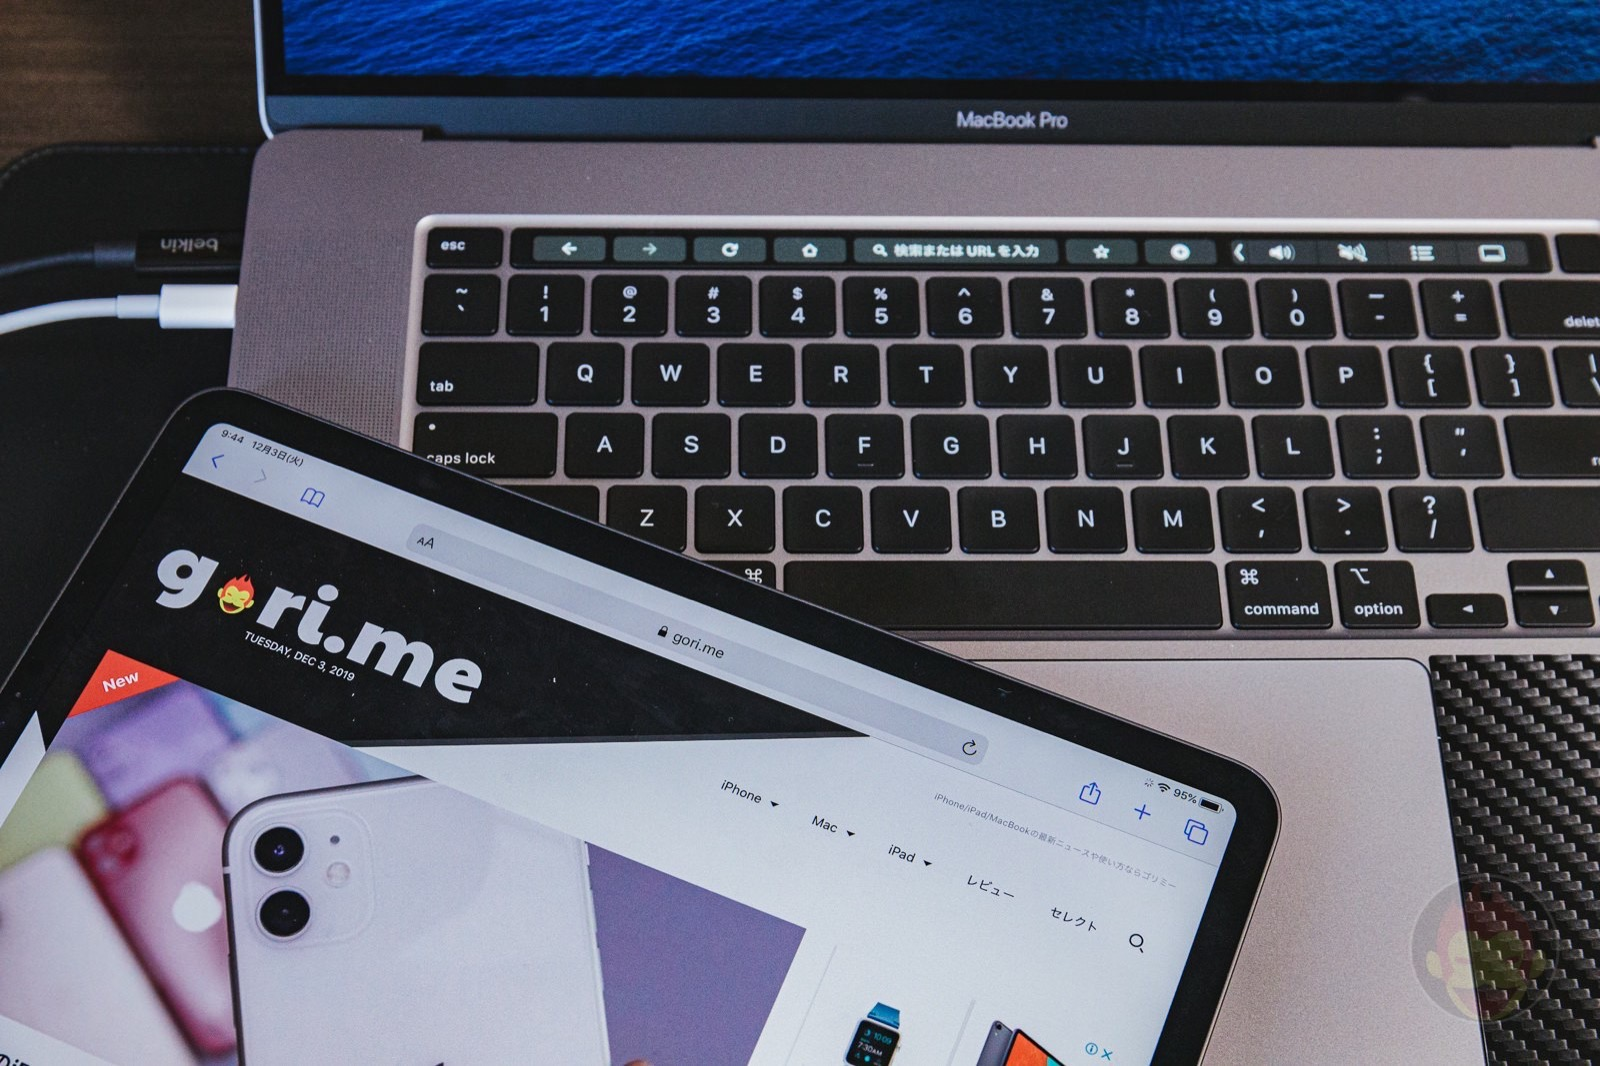 MacBook-Pro-16-and-ipad-pro-11-01.jpg